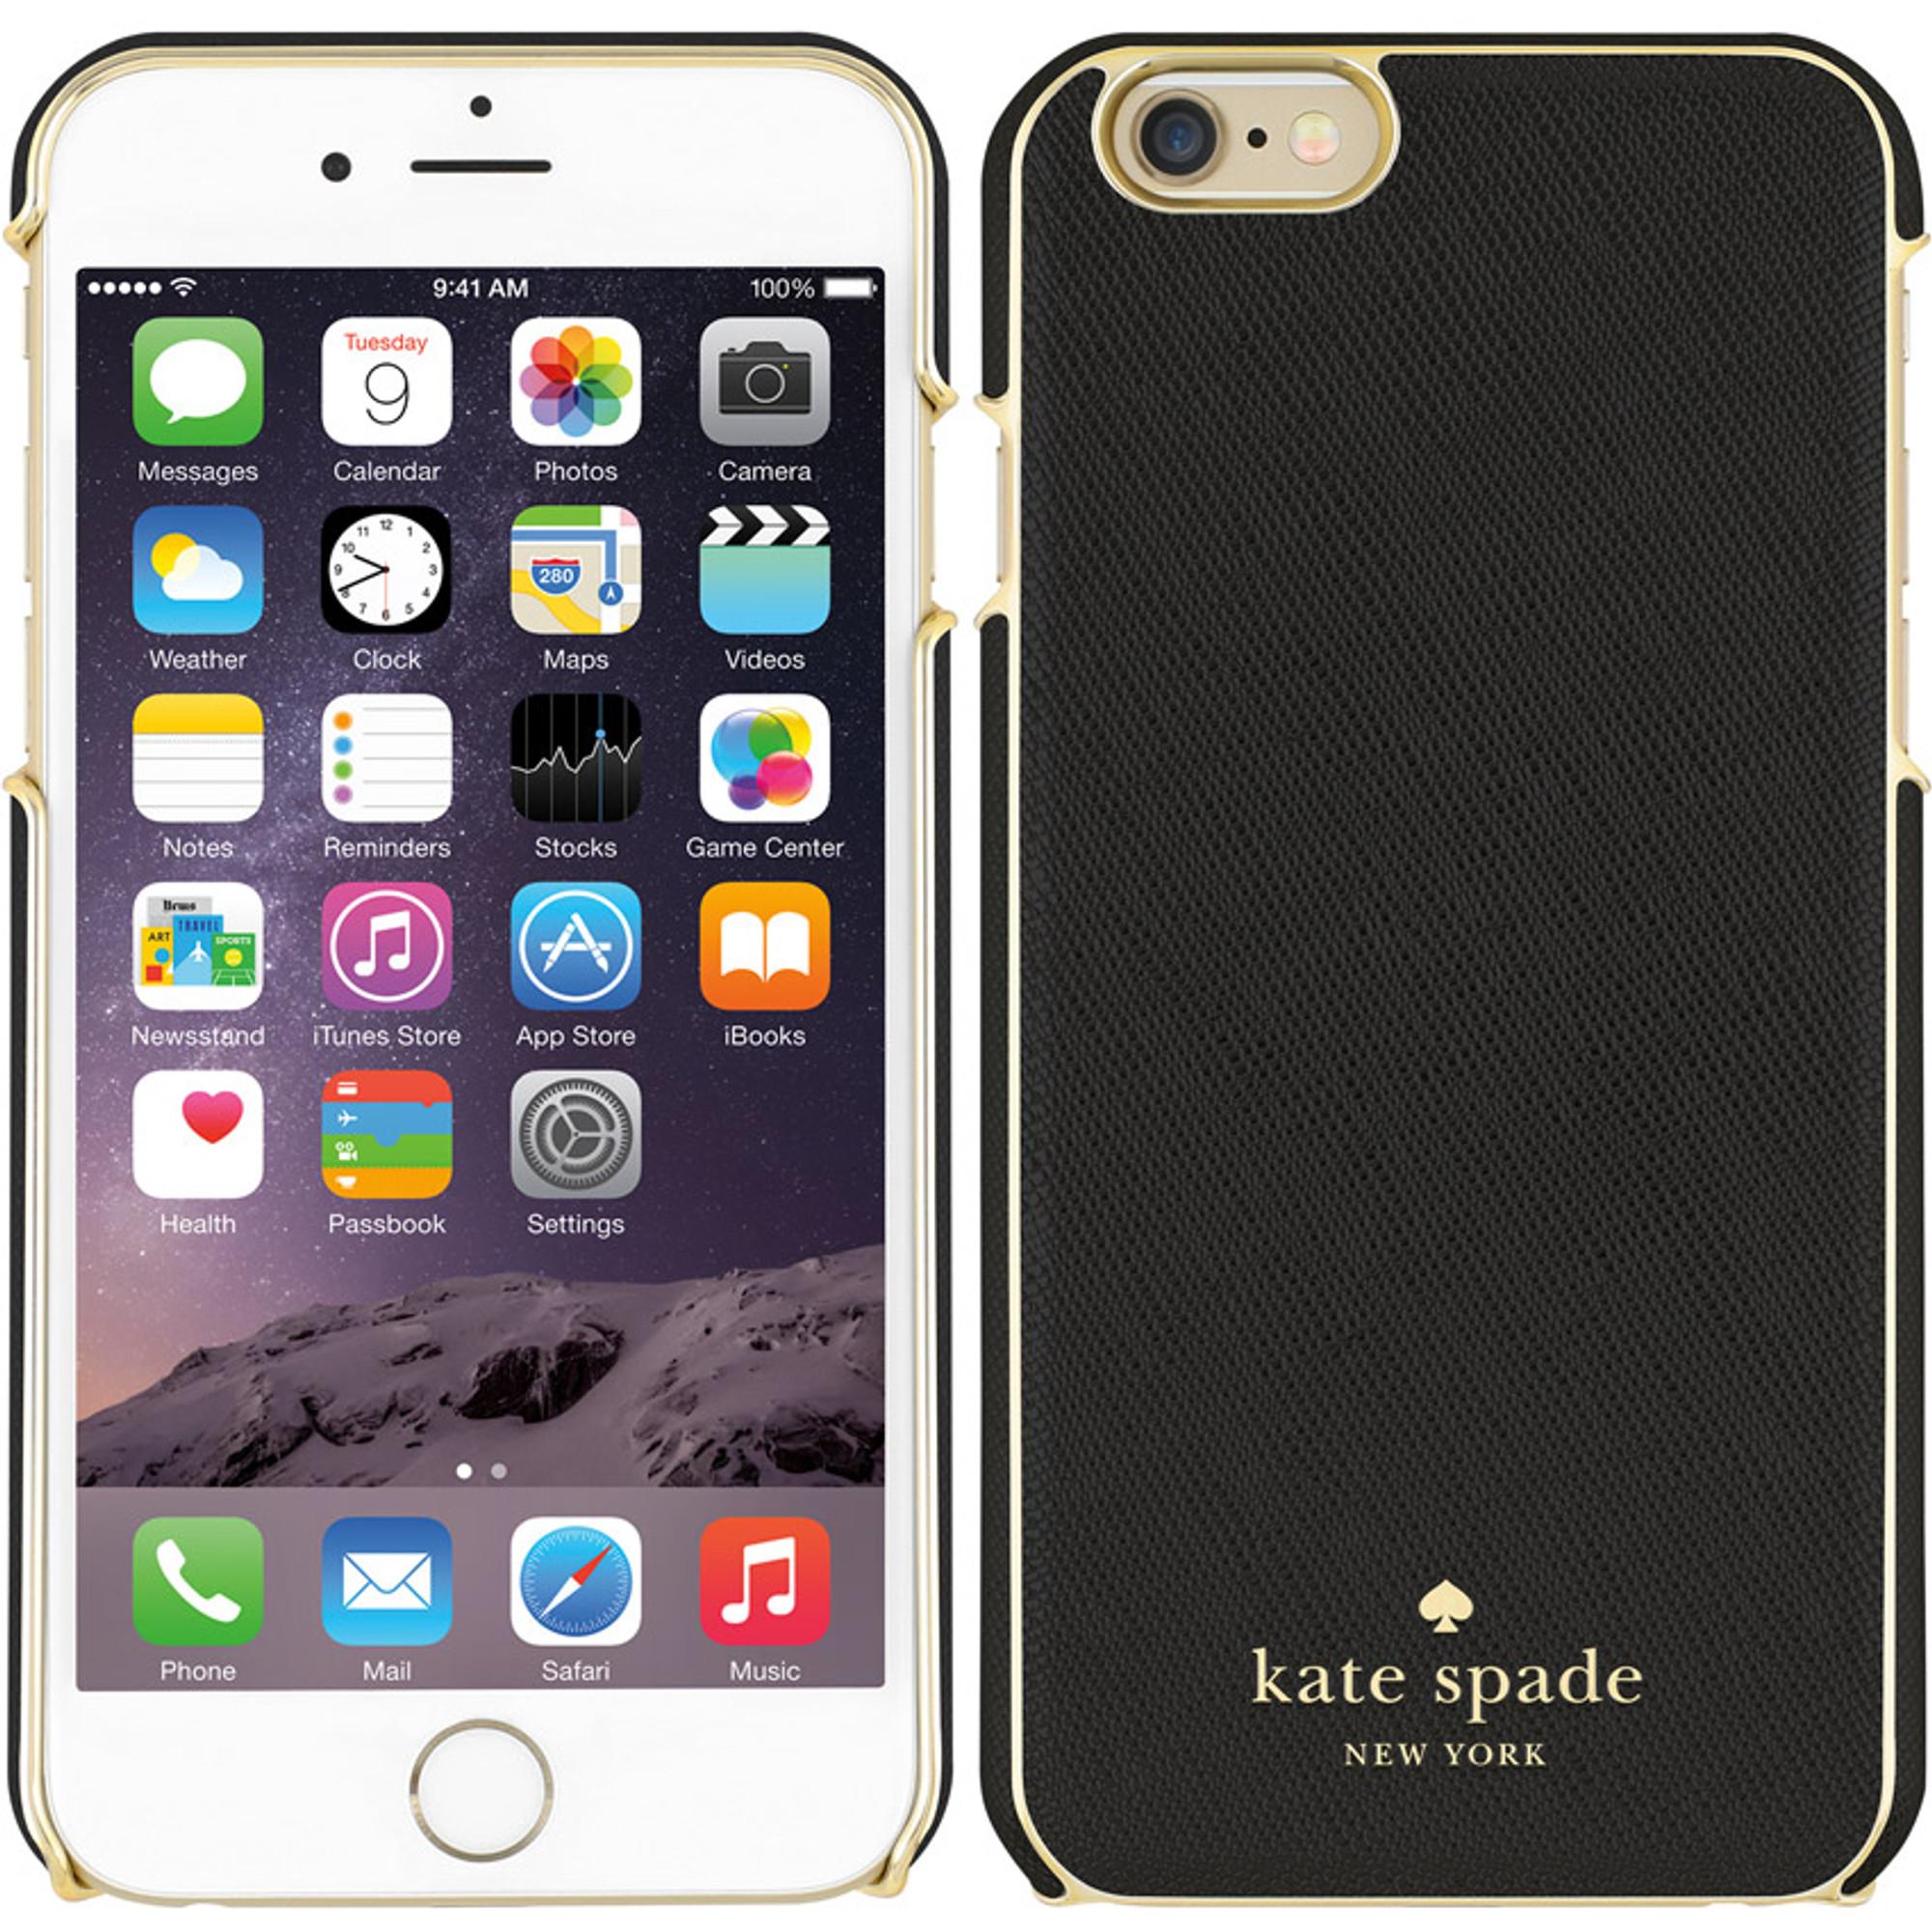 promo code d7ceb 9a95b Incipio Kate Spade New York Case for iPhone 6S Plus / 6 Plus - Wrap Black